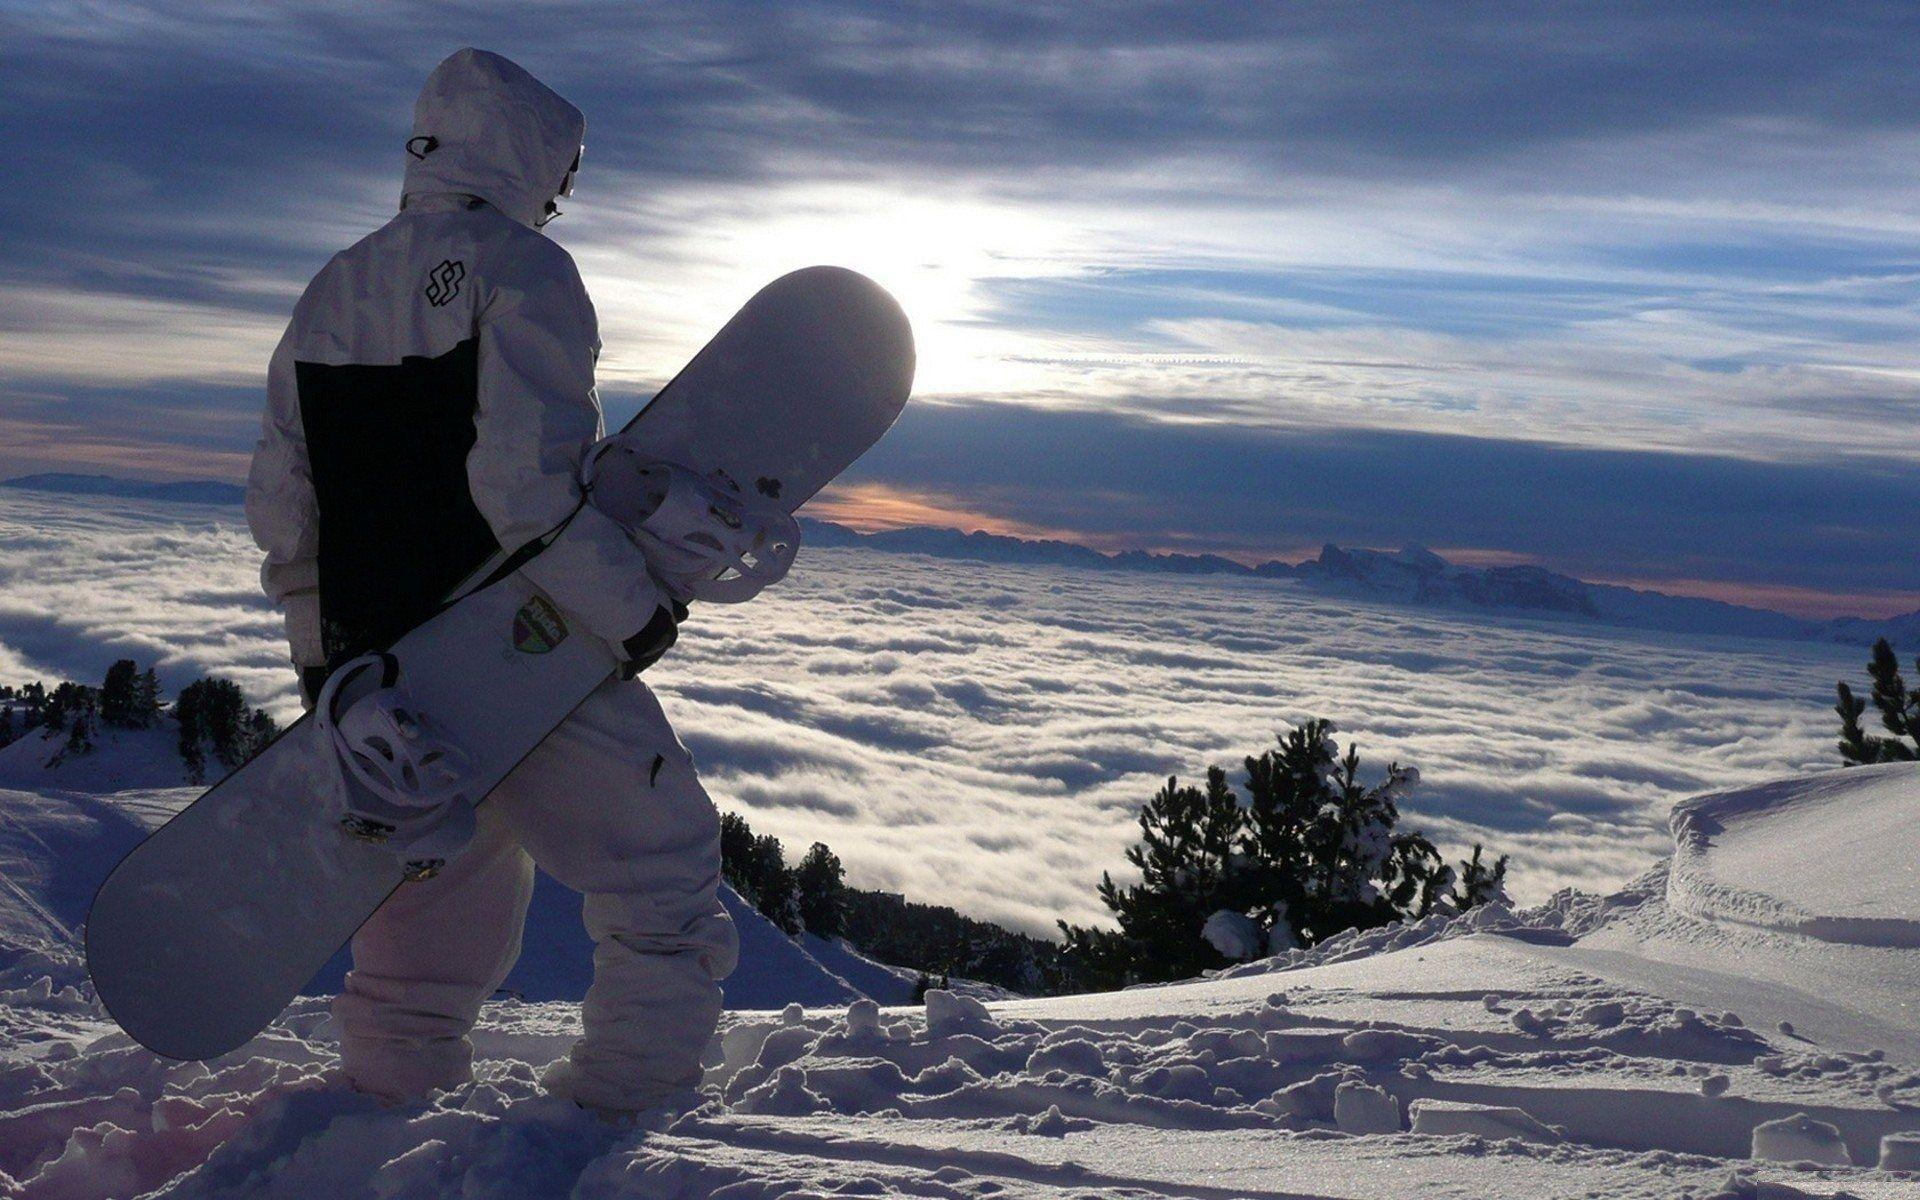 snowboard wallpaper hd  Snowboarding Wallpapers HD - Wallpaper Cave